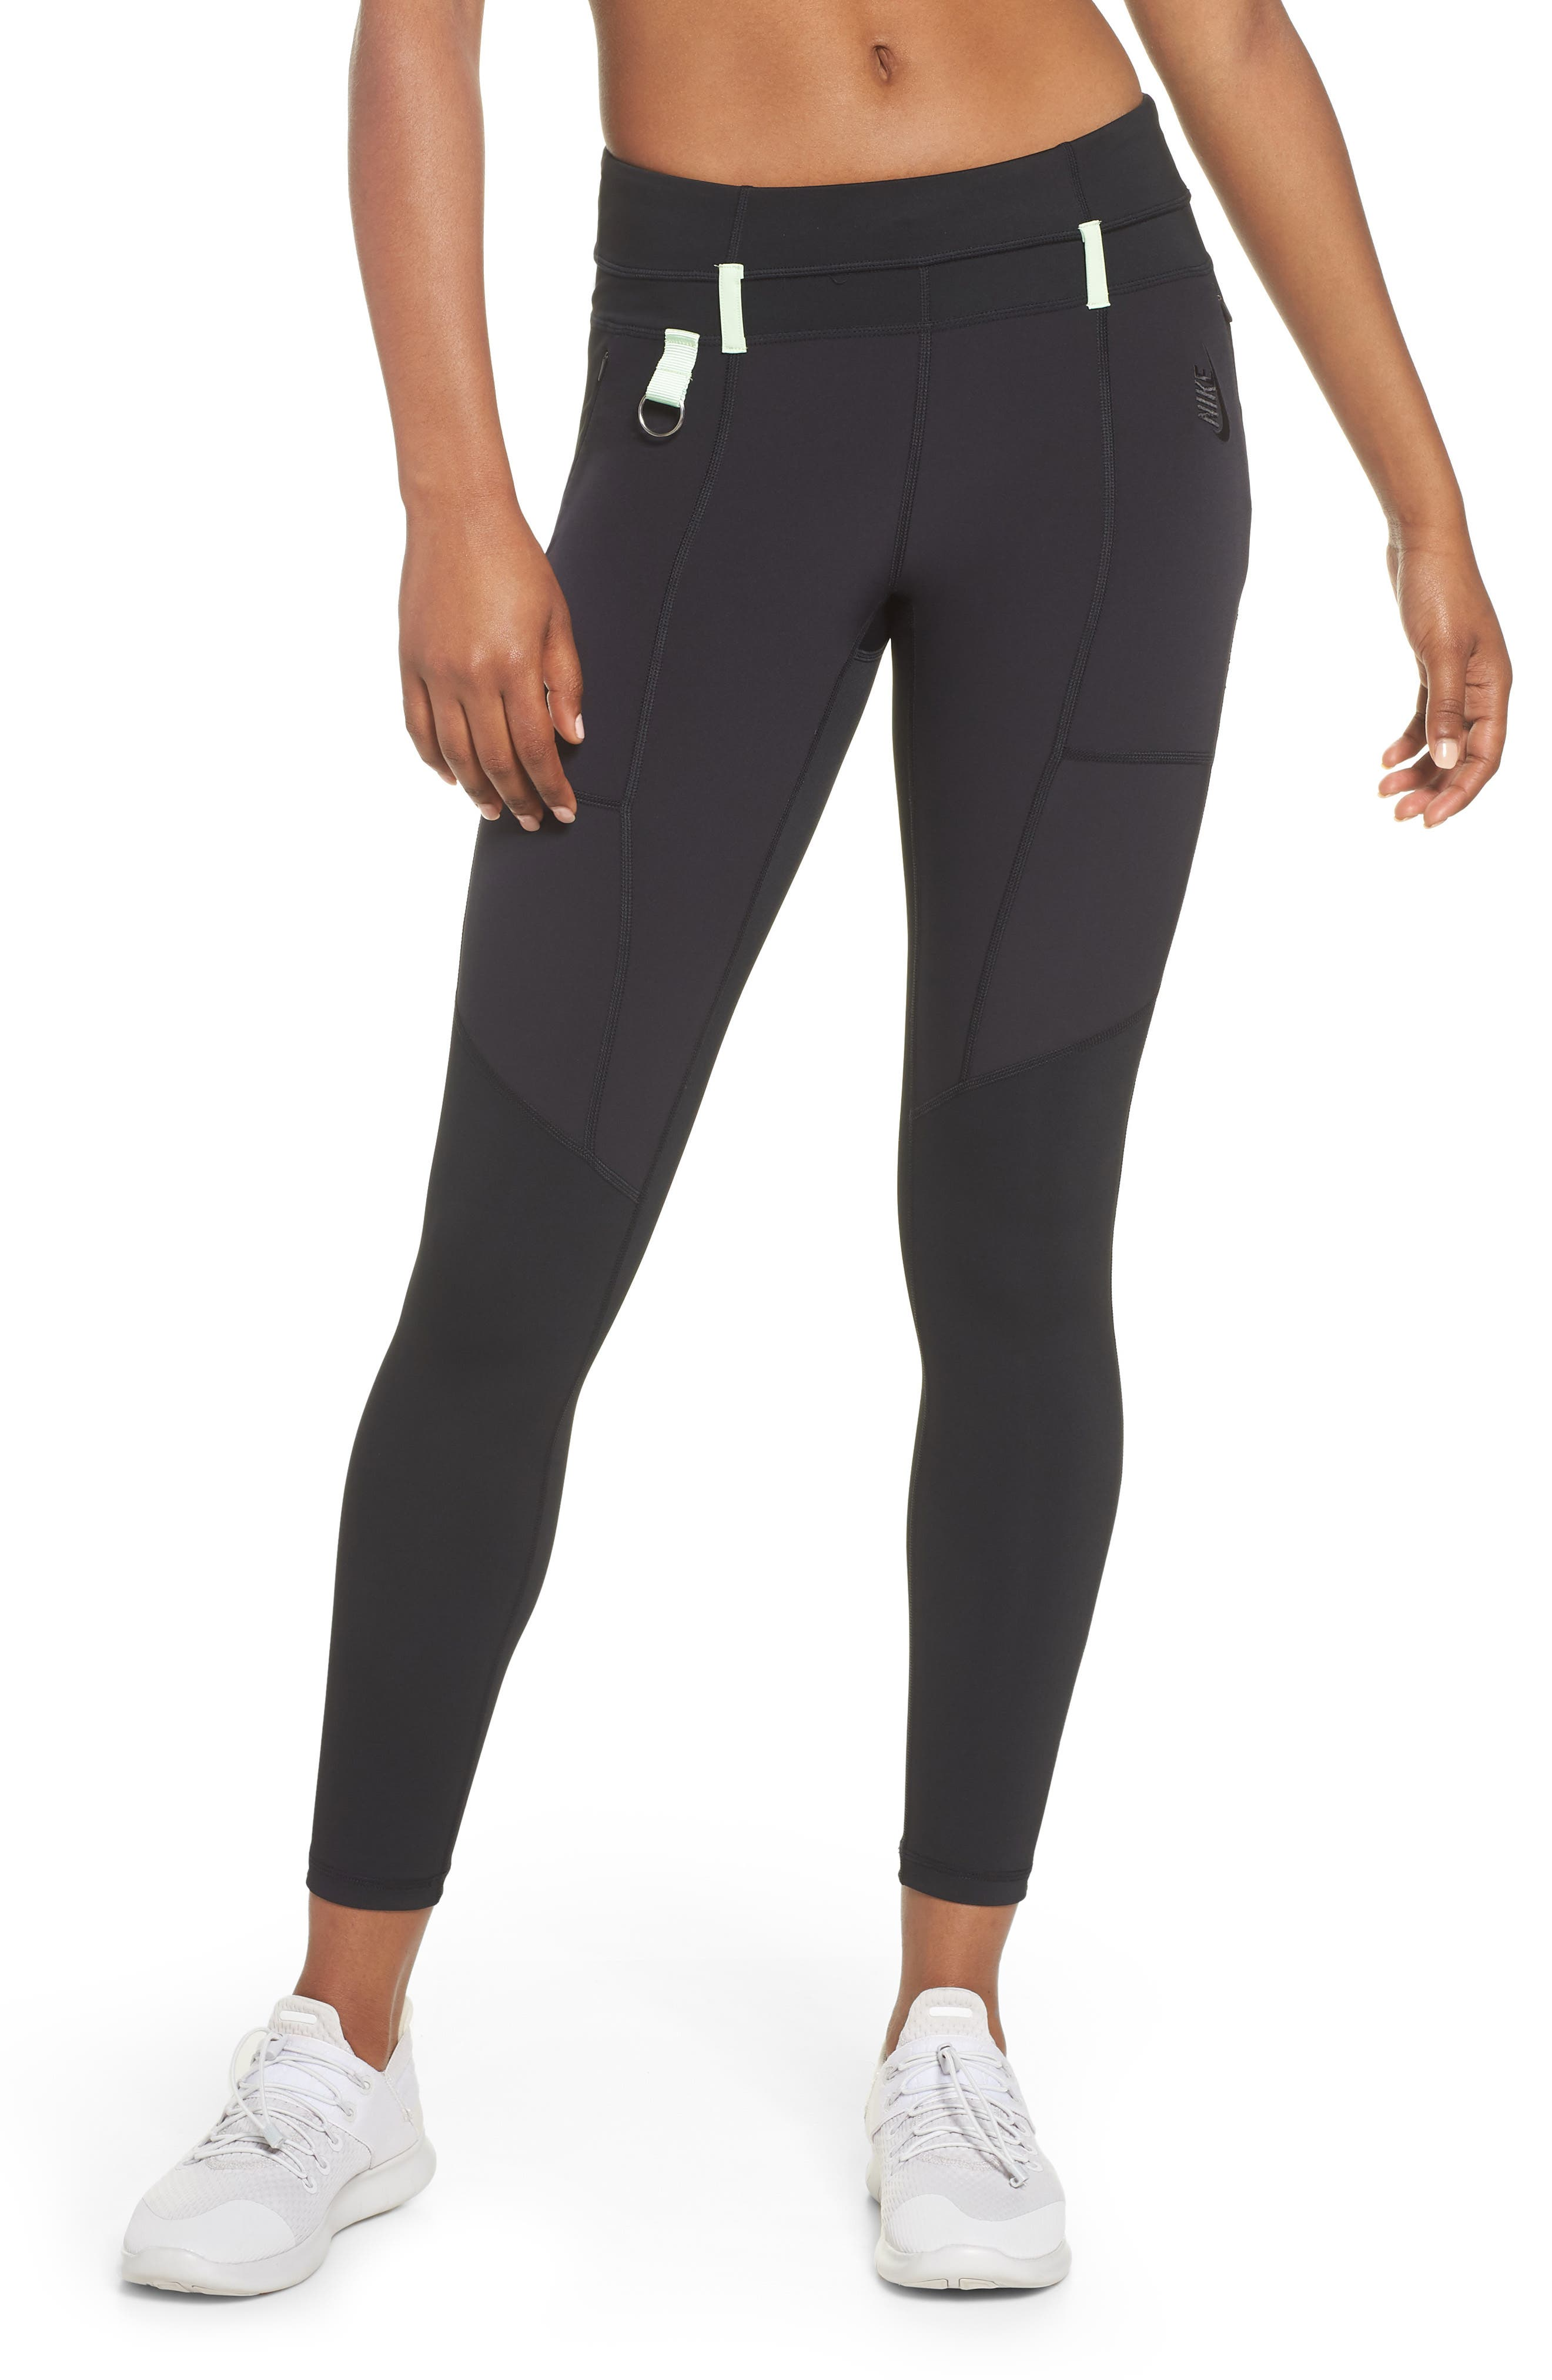 NRG Women's Dri-FIT Tights,                         Main,                         color, BLACK/ VAPOR GREEN/ BLACK